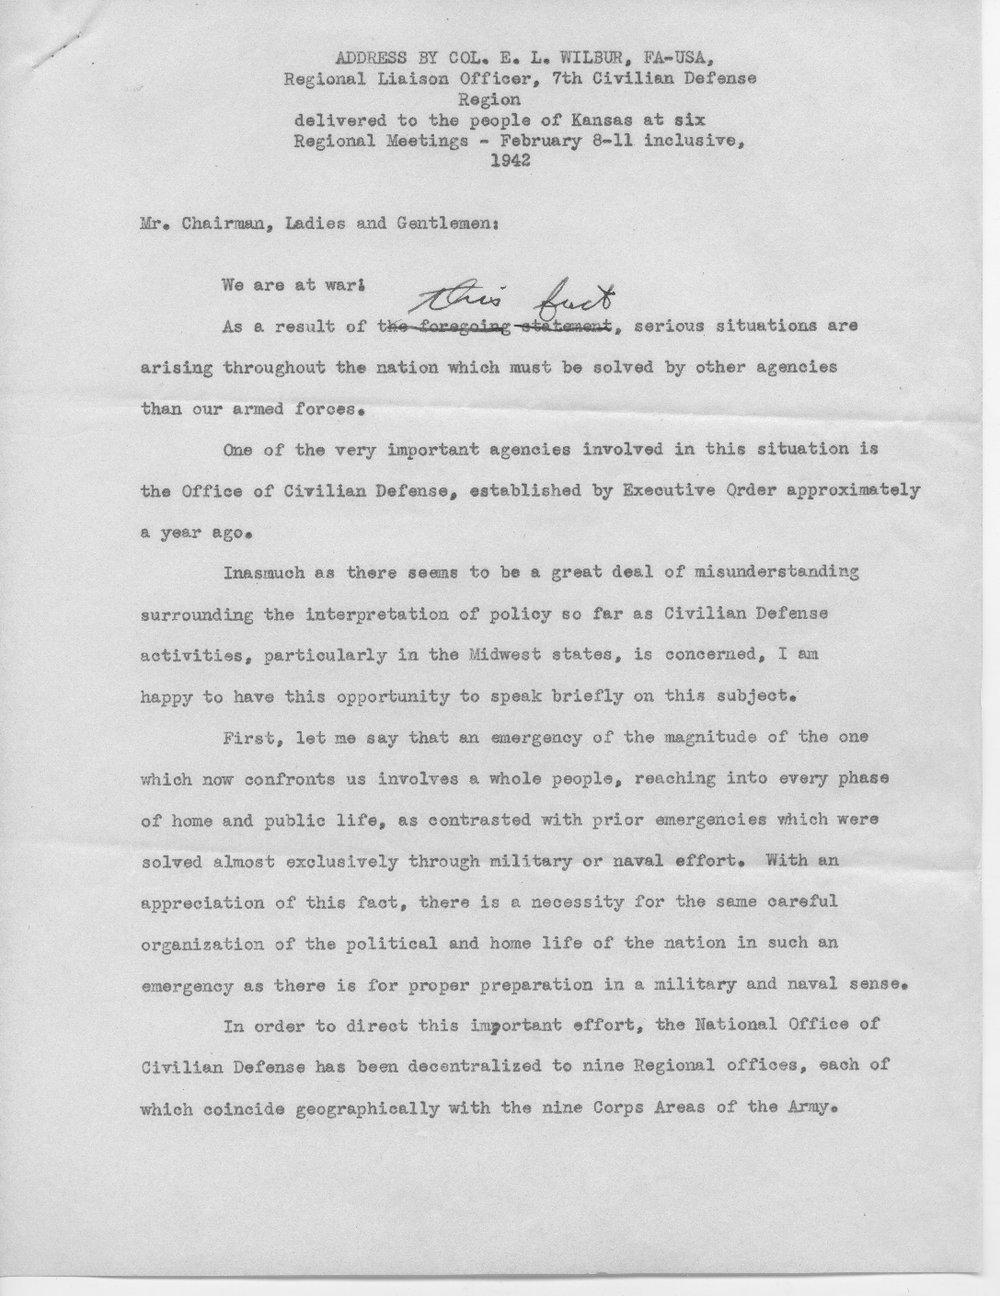 Address by Col. E.L. Wilbur - 1